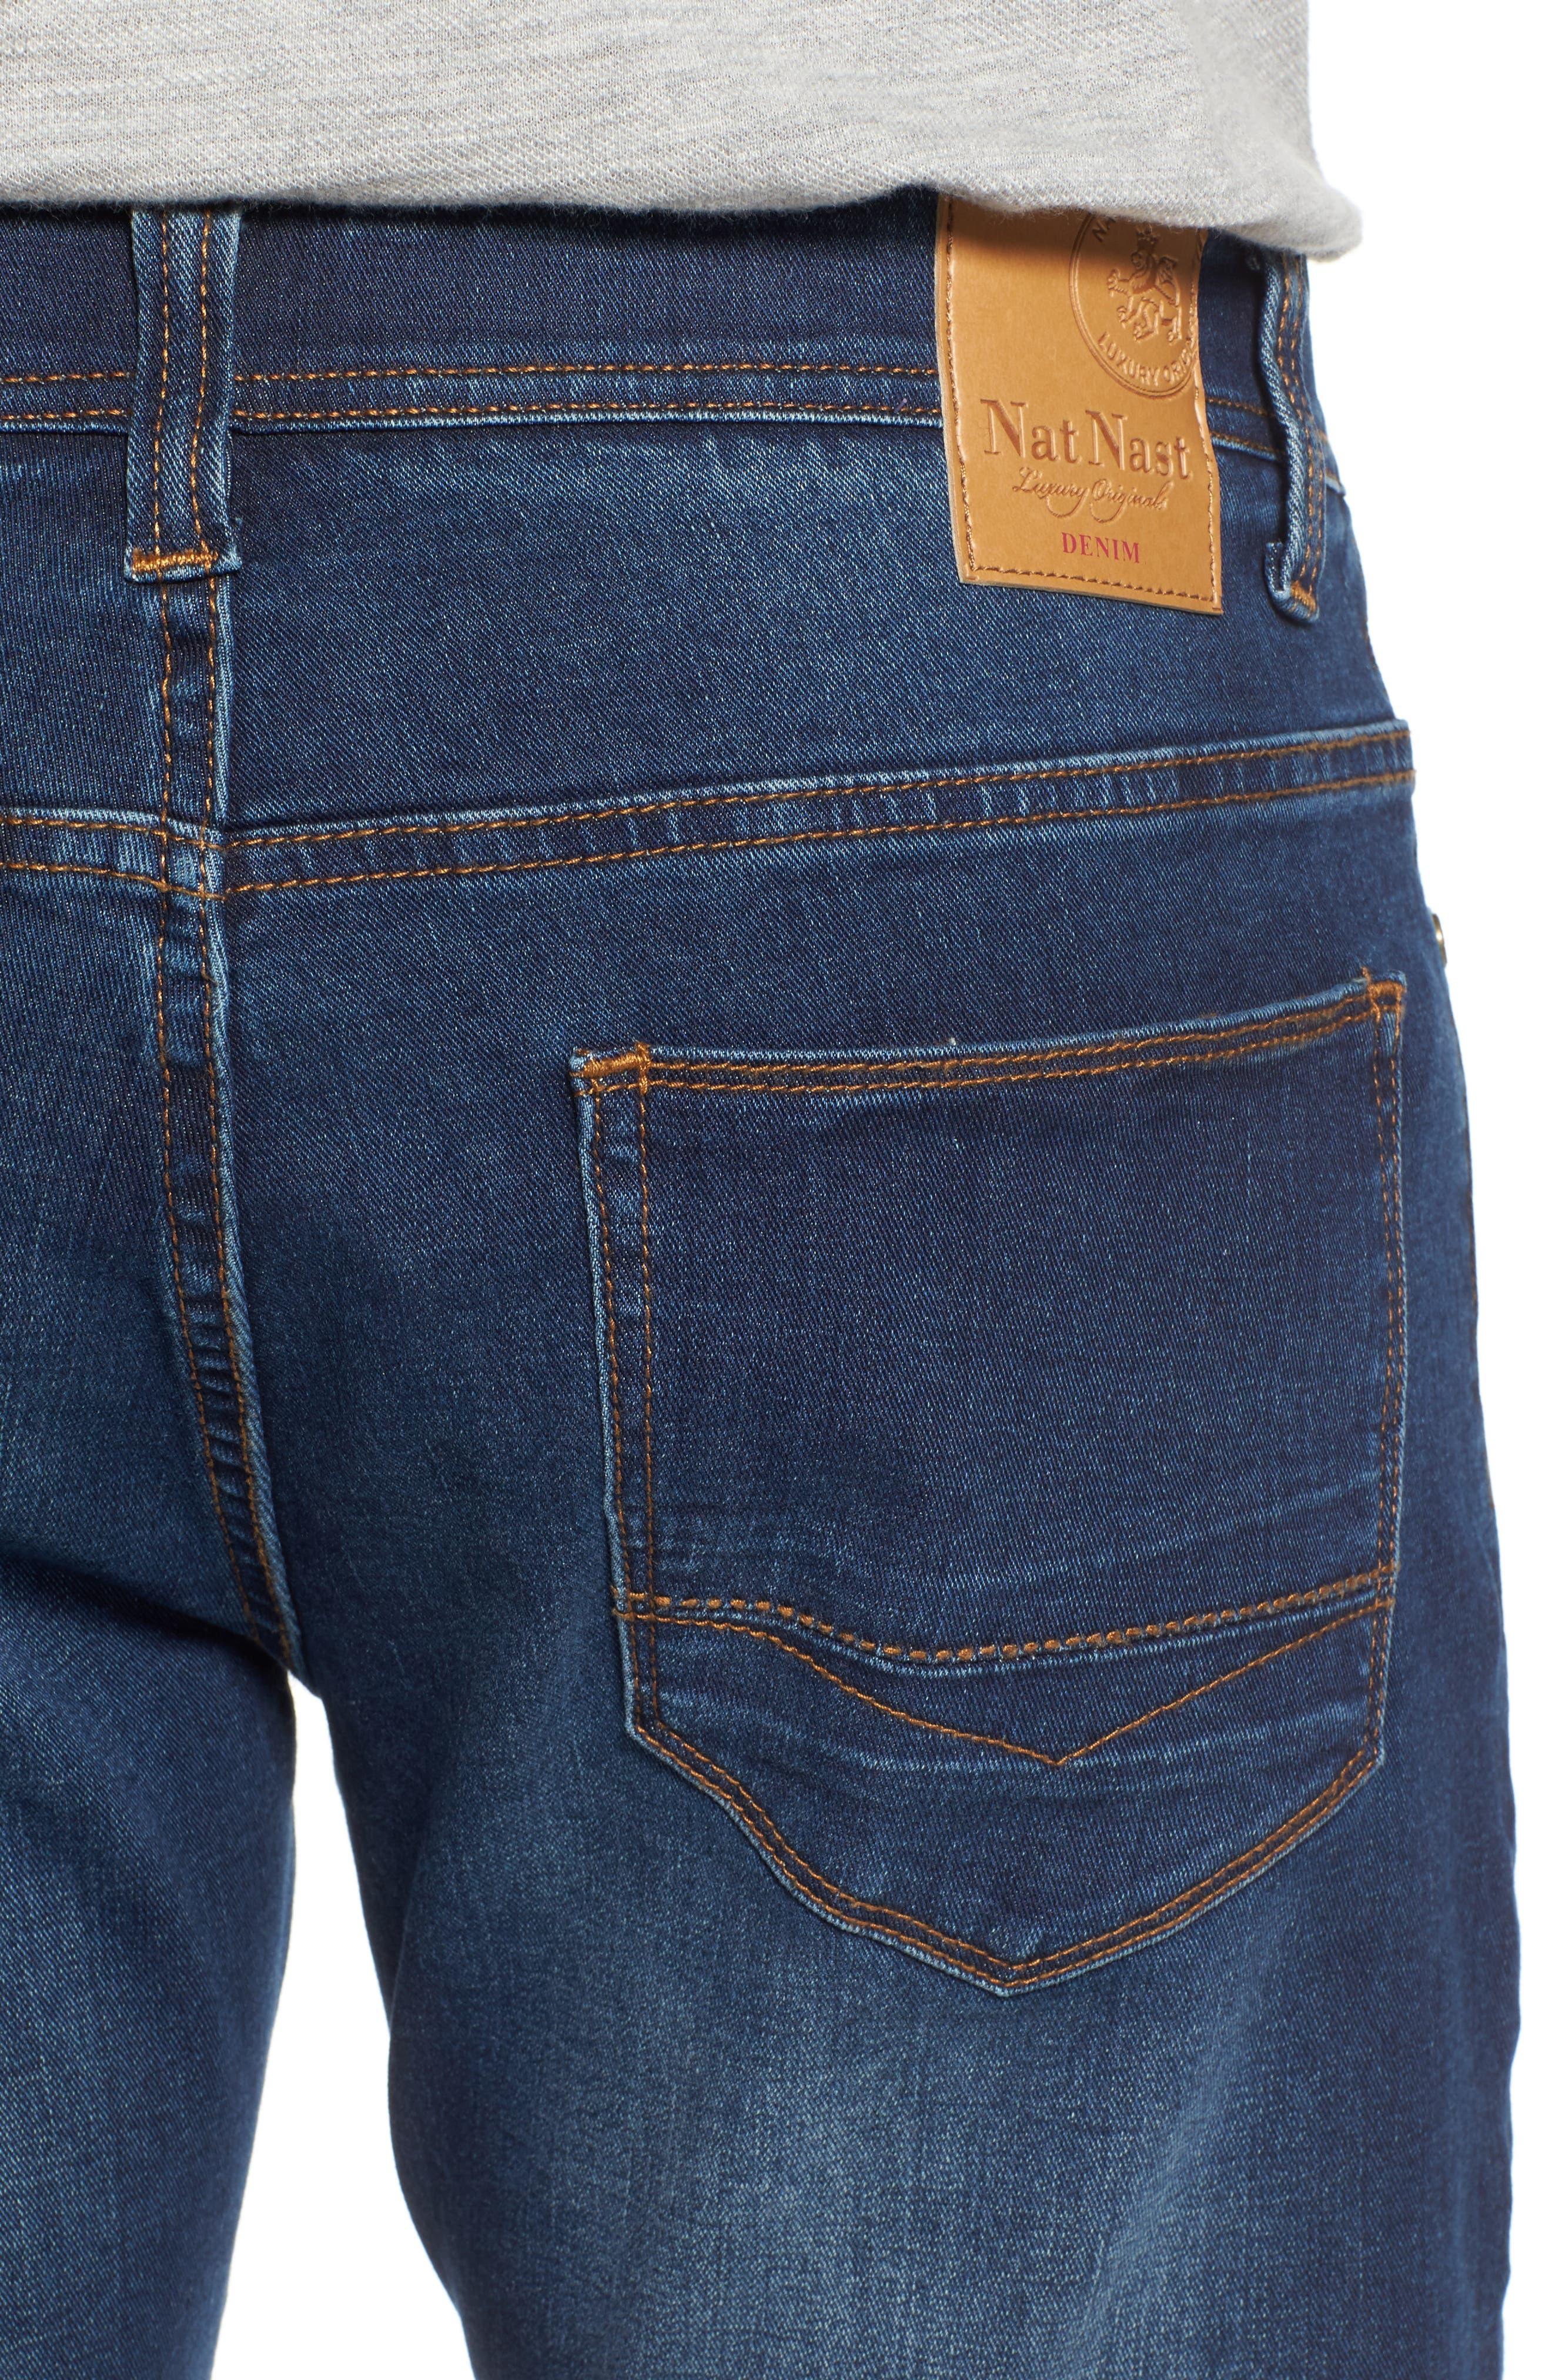 Maverick Stretch Slim Fit Jeans,                             Alternate thumbnail 4, color,                             400